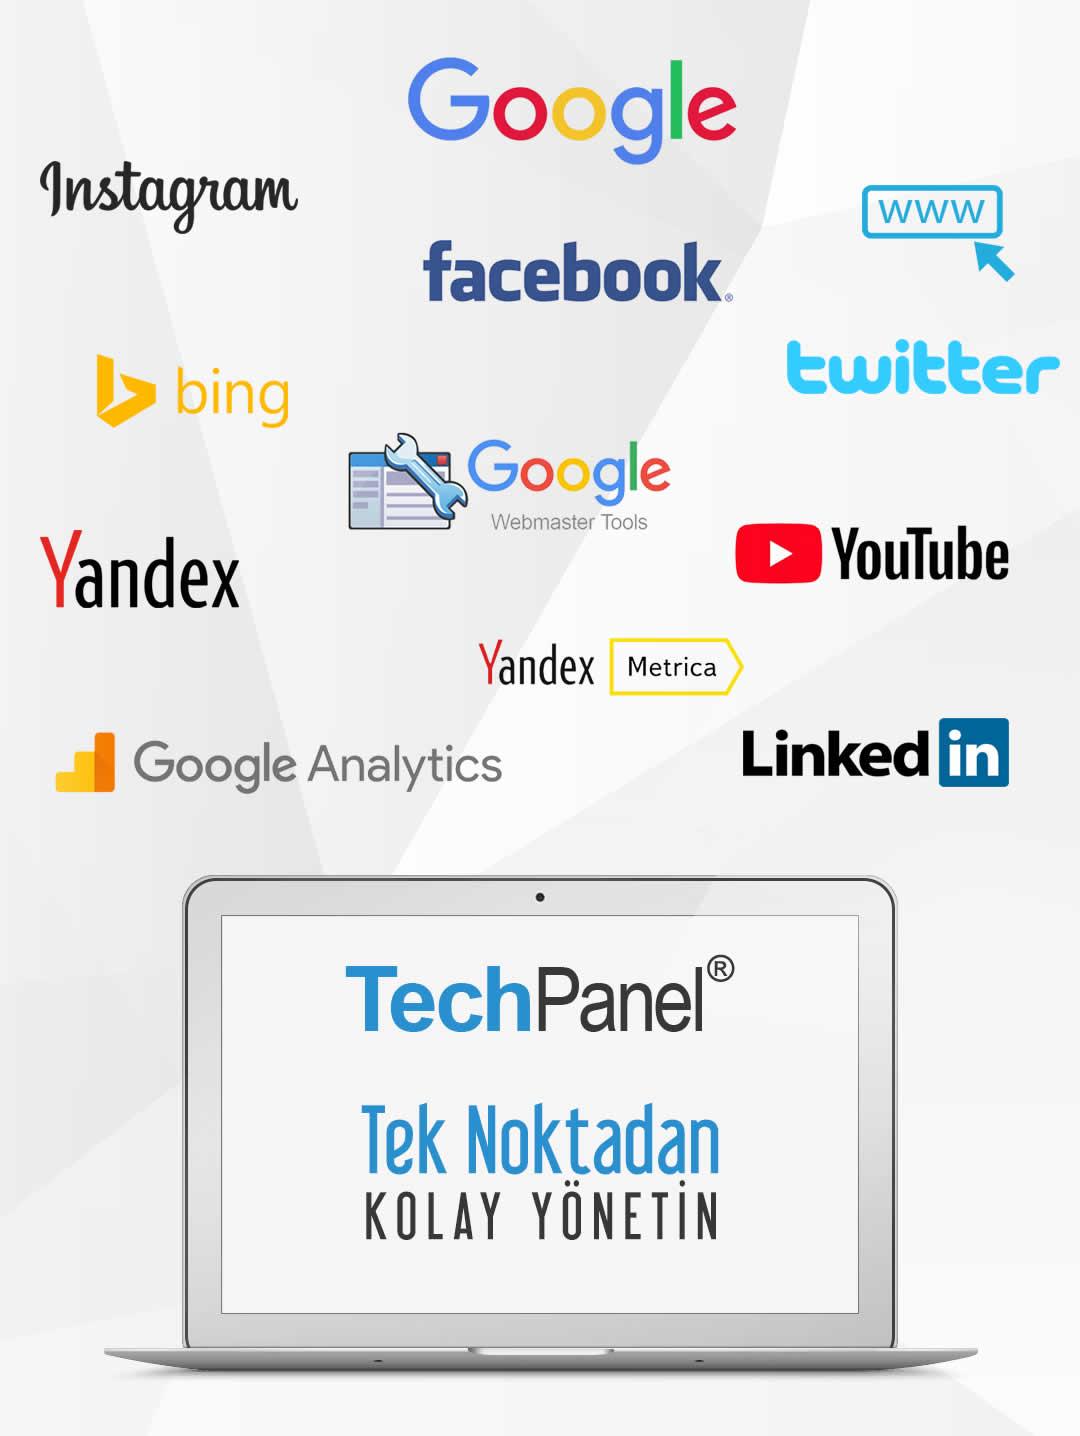 Techpanel